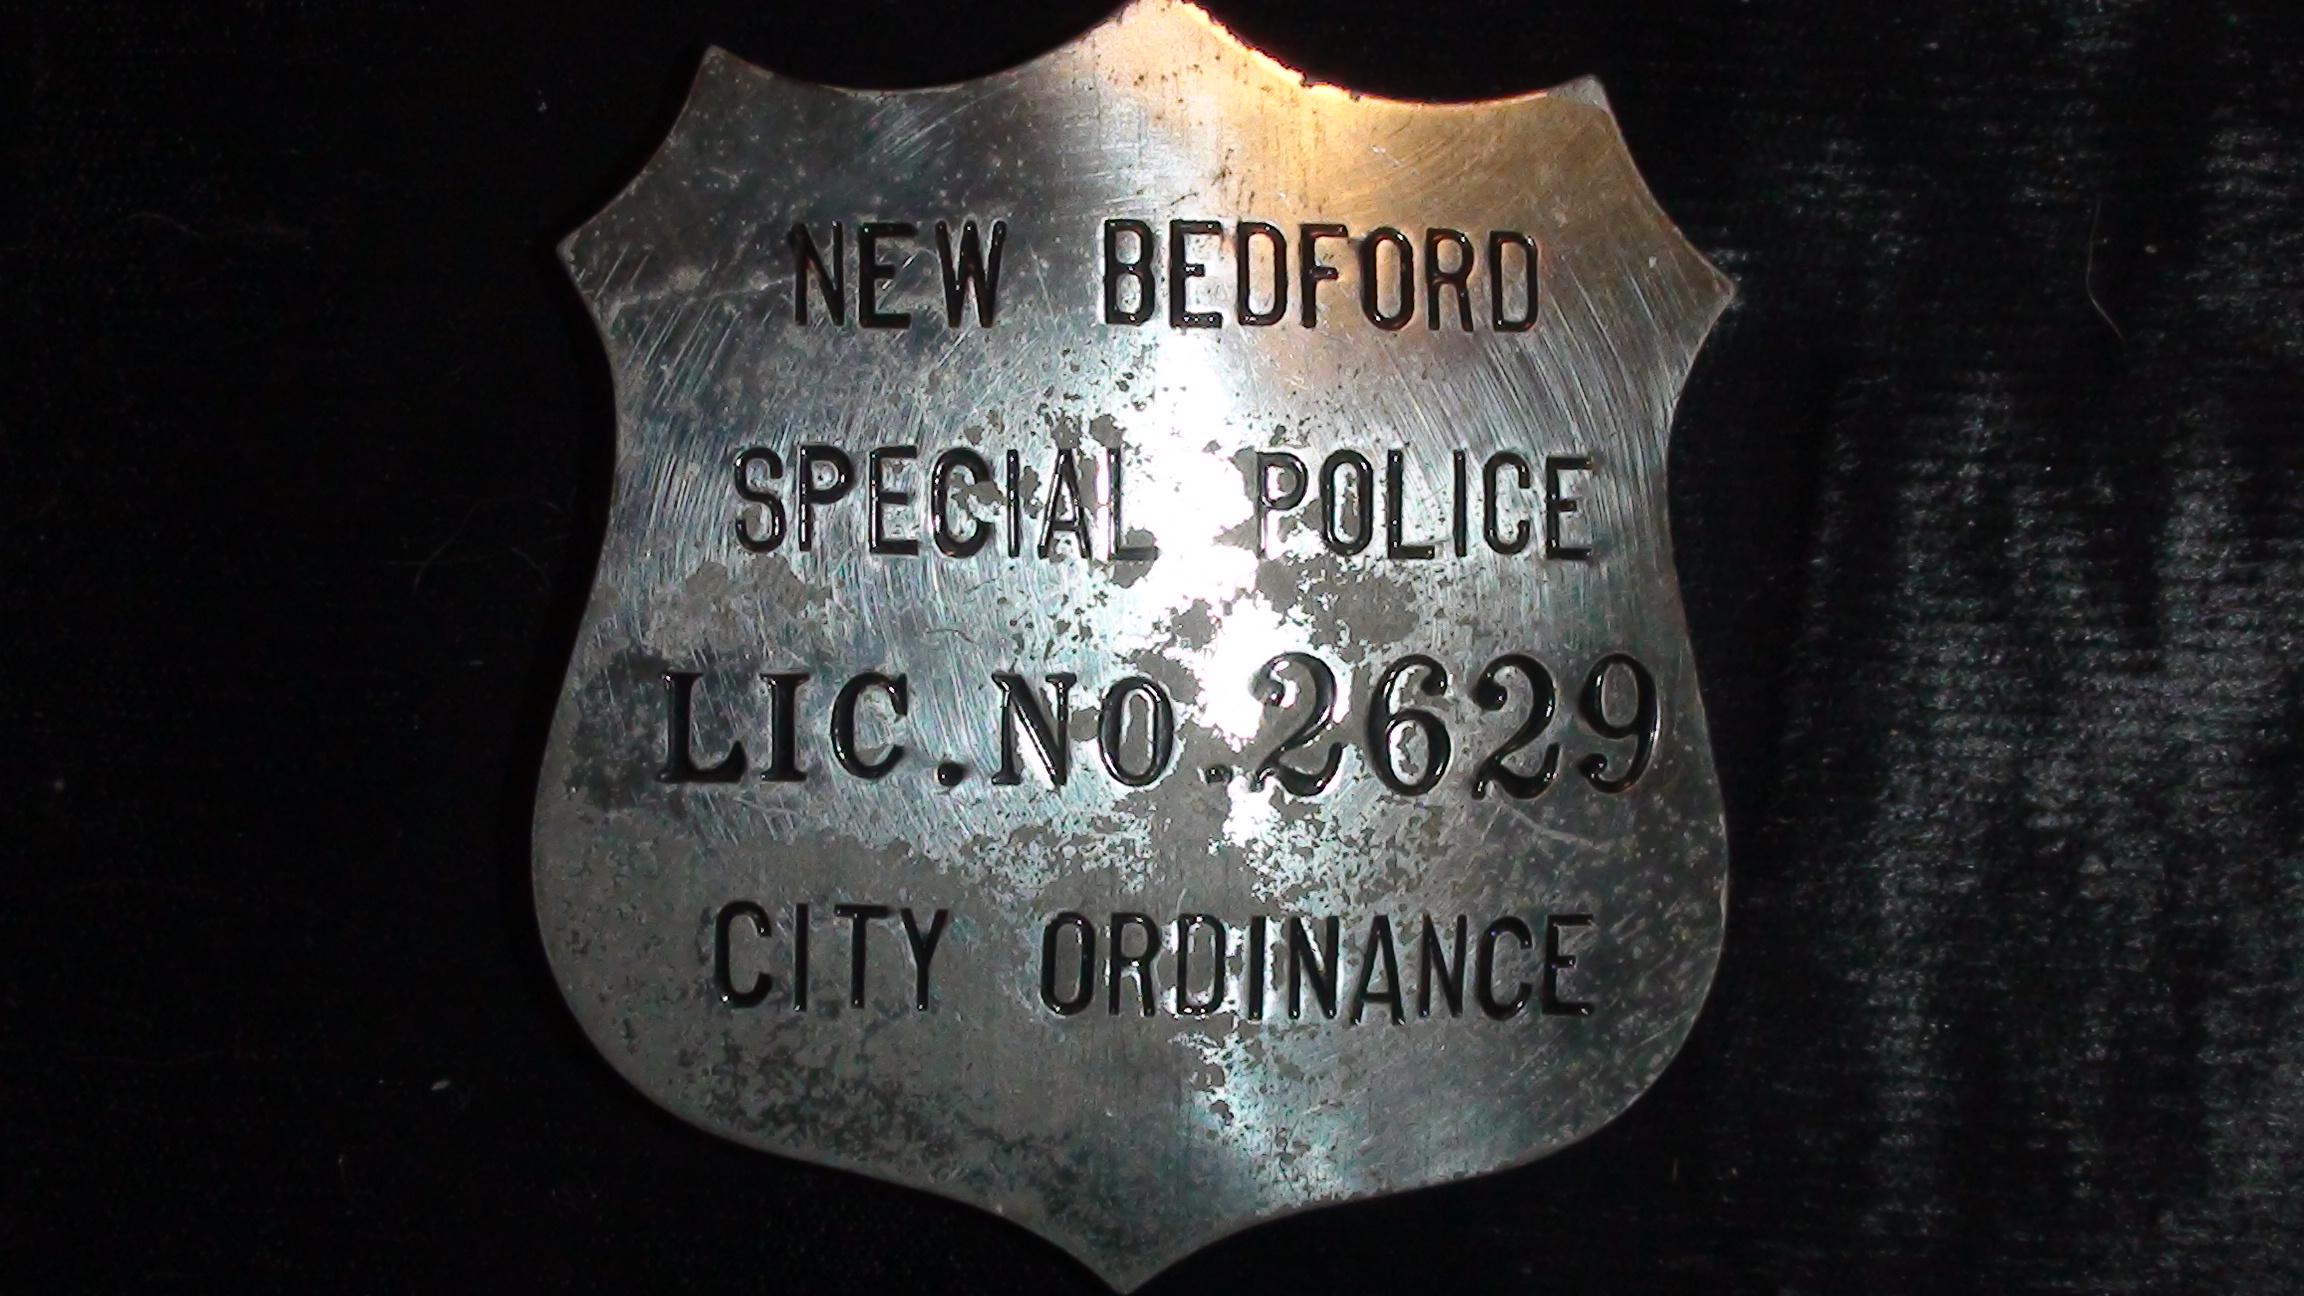 Vintage 1953 New Bedford Special Police Badge.